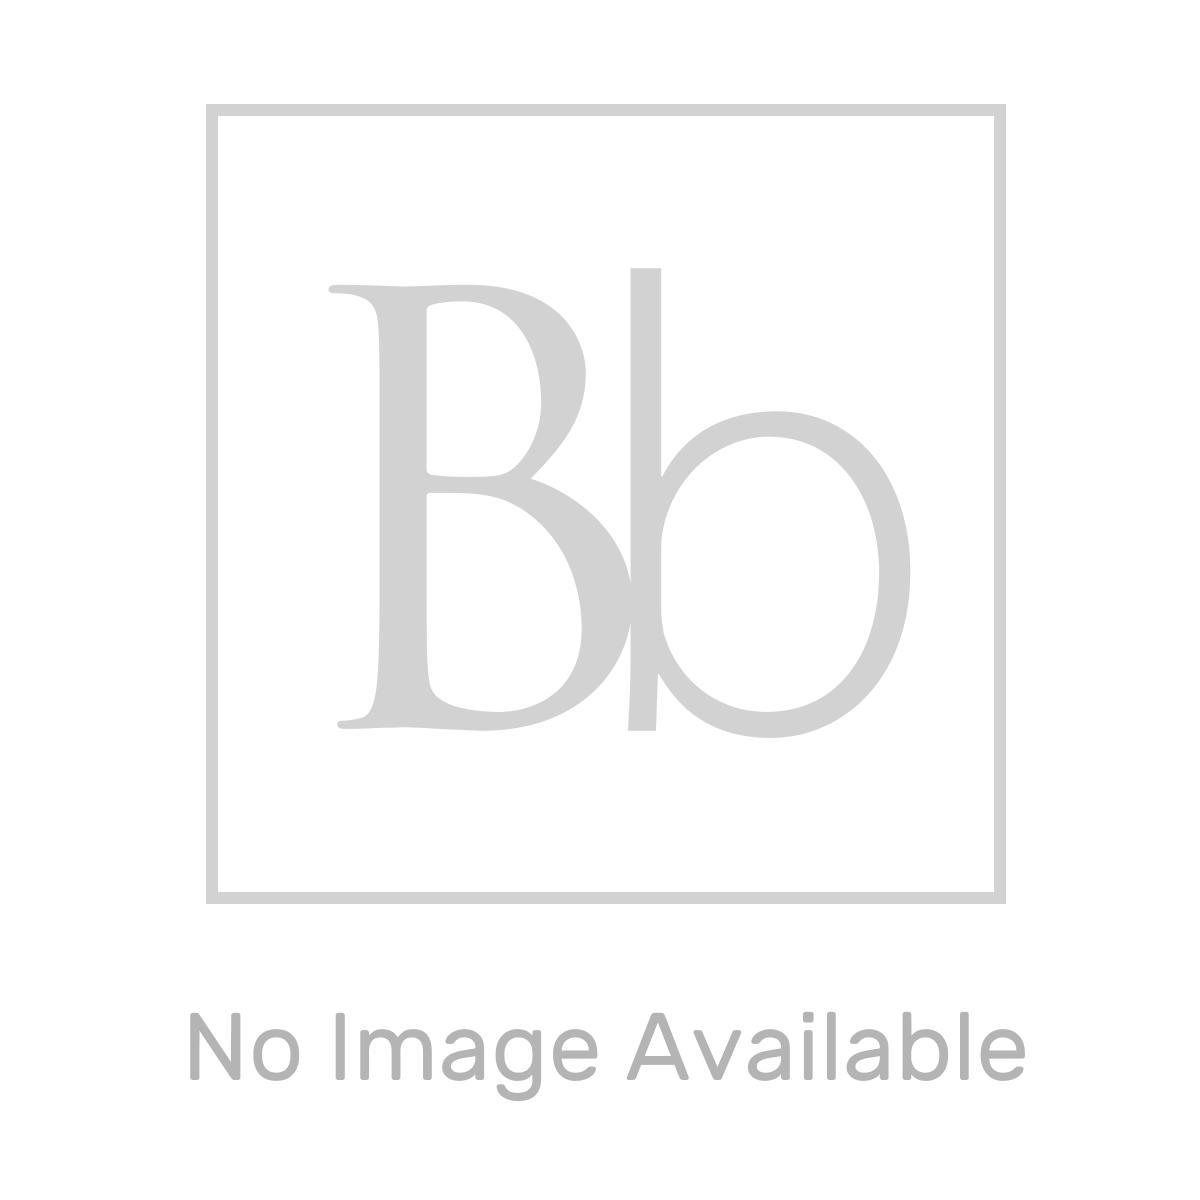 RAK Surface Light Sand Lappato Tile 300 x 600mm